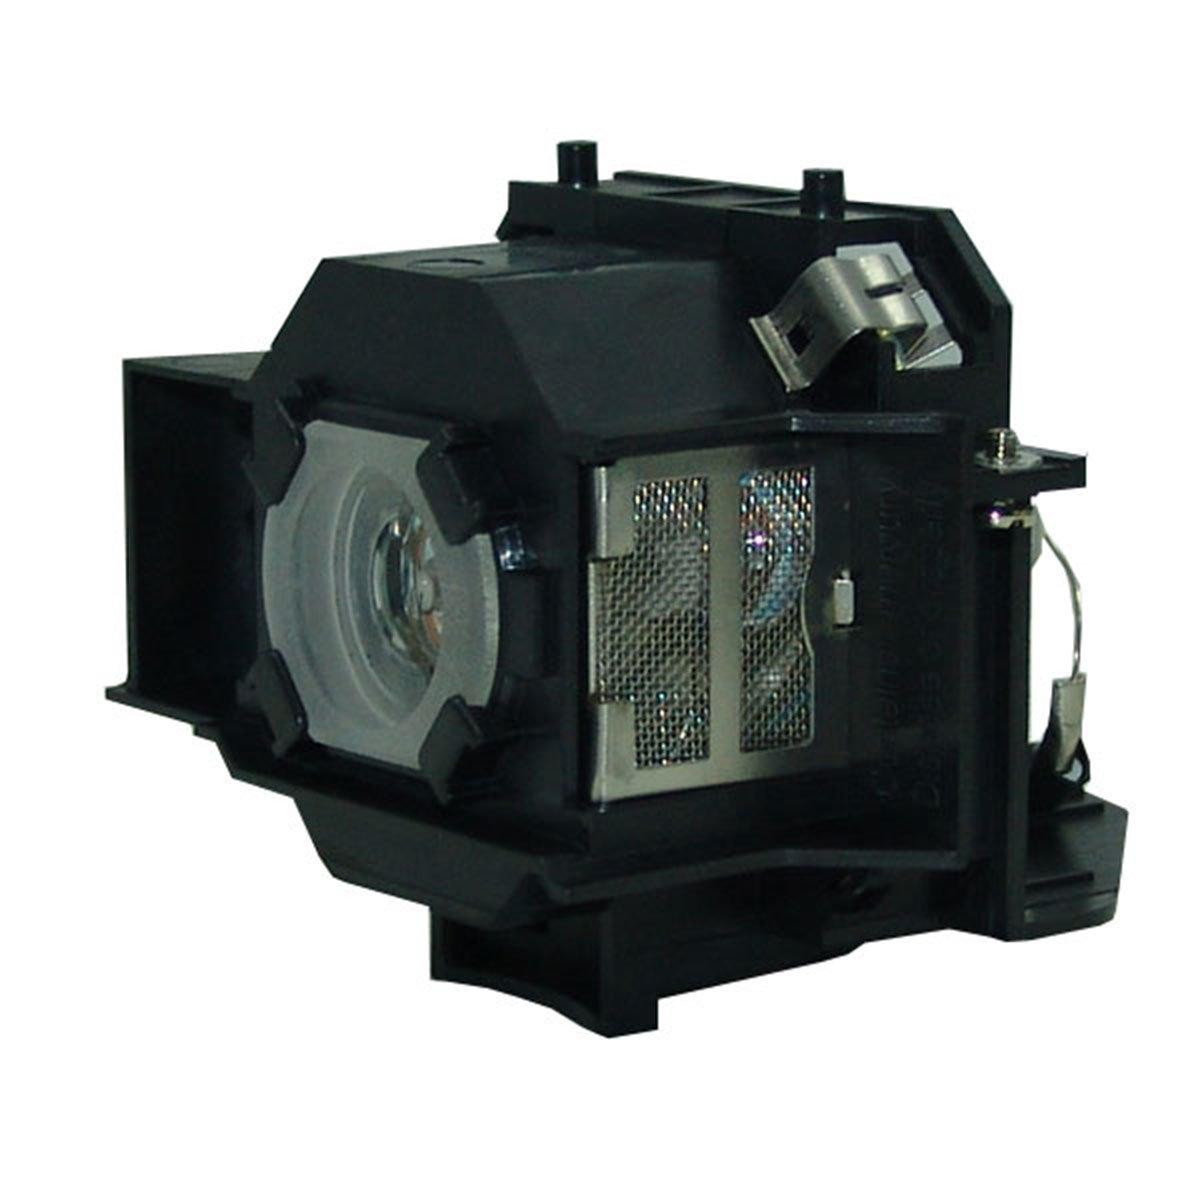 Lutema OEM プロジェクター交換用ランプ ハウジング/電球付き Epson PowerLite Home 20用 Economy B07KTLBNXT Lamp with Housing Economy